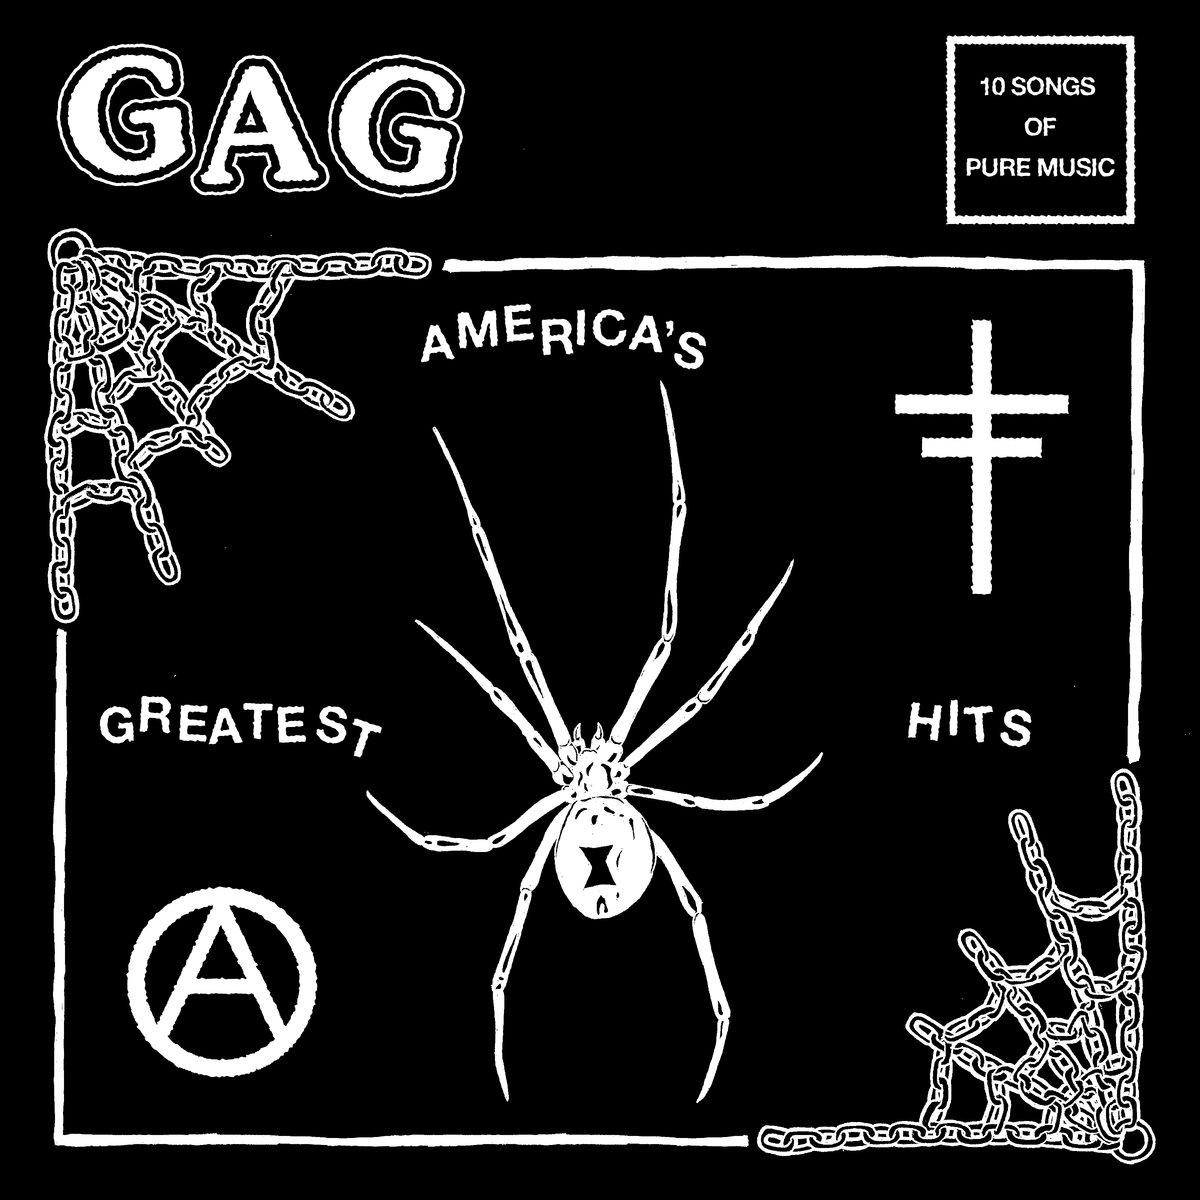 Gag - America's Greatest Hits LP